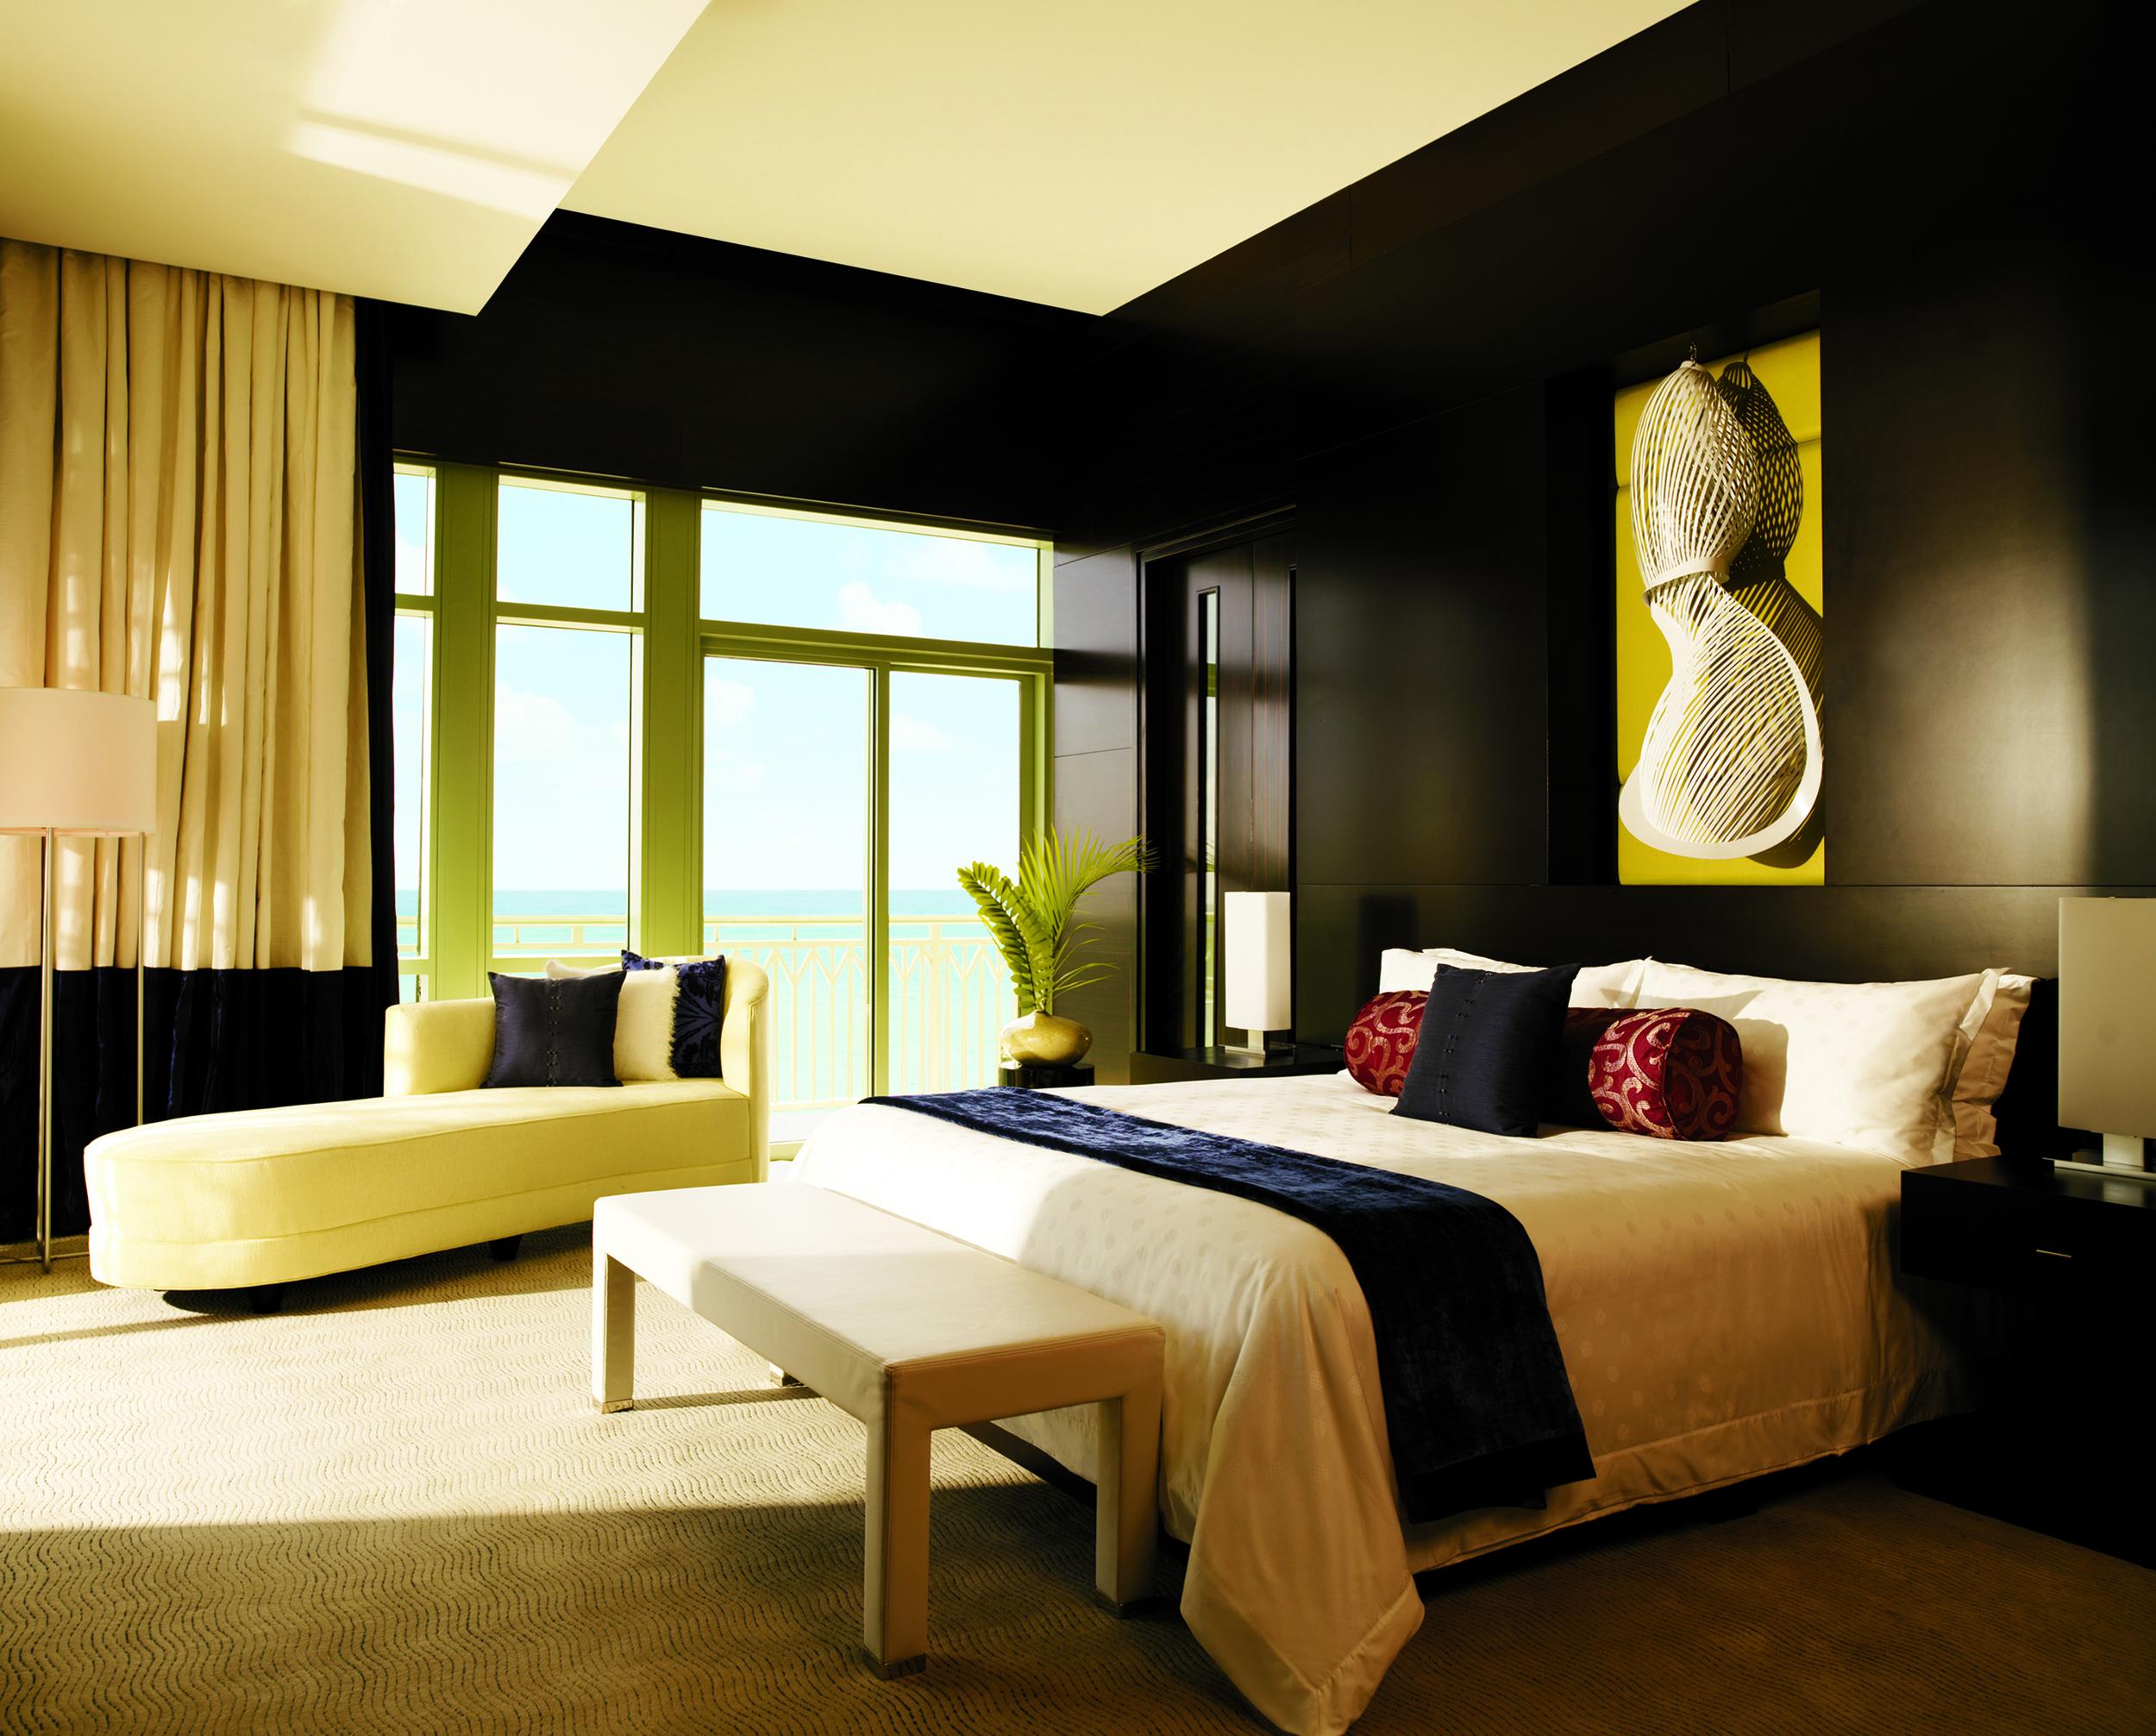 Penthouse_Suite_Master_Bedroom_1232_standard.jpg